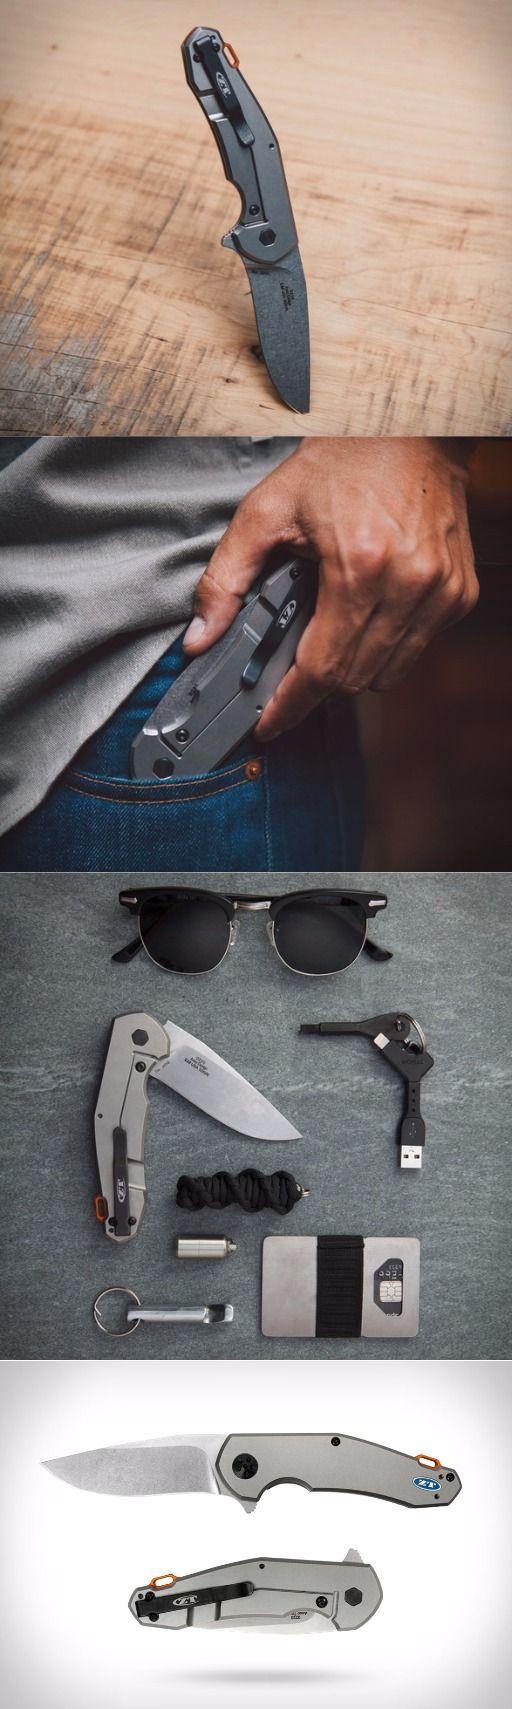 Zero Tolerance ZT 0220 Jens Anso TI KVT EDC Flipper Folding Knife Blade - Everyday Carry Flipper